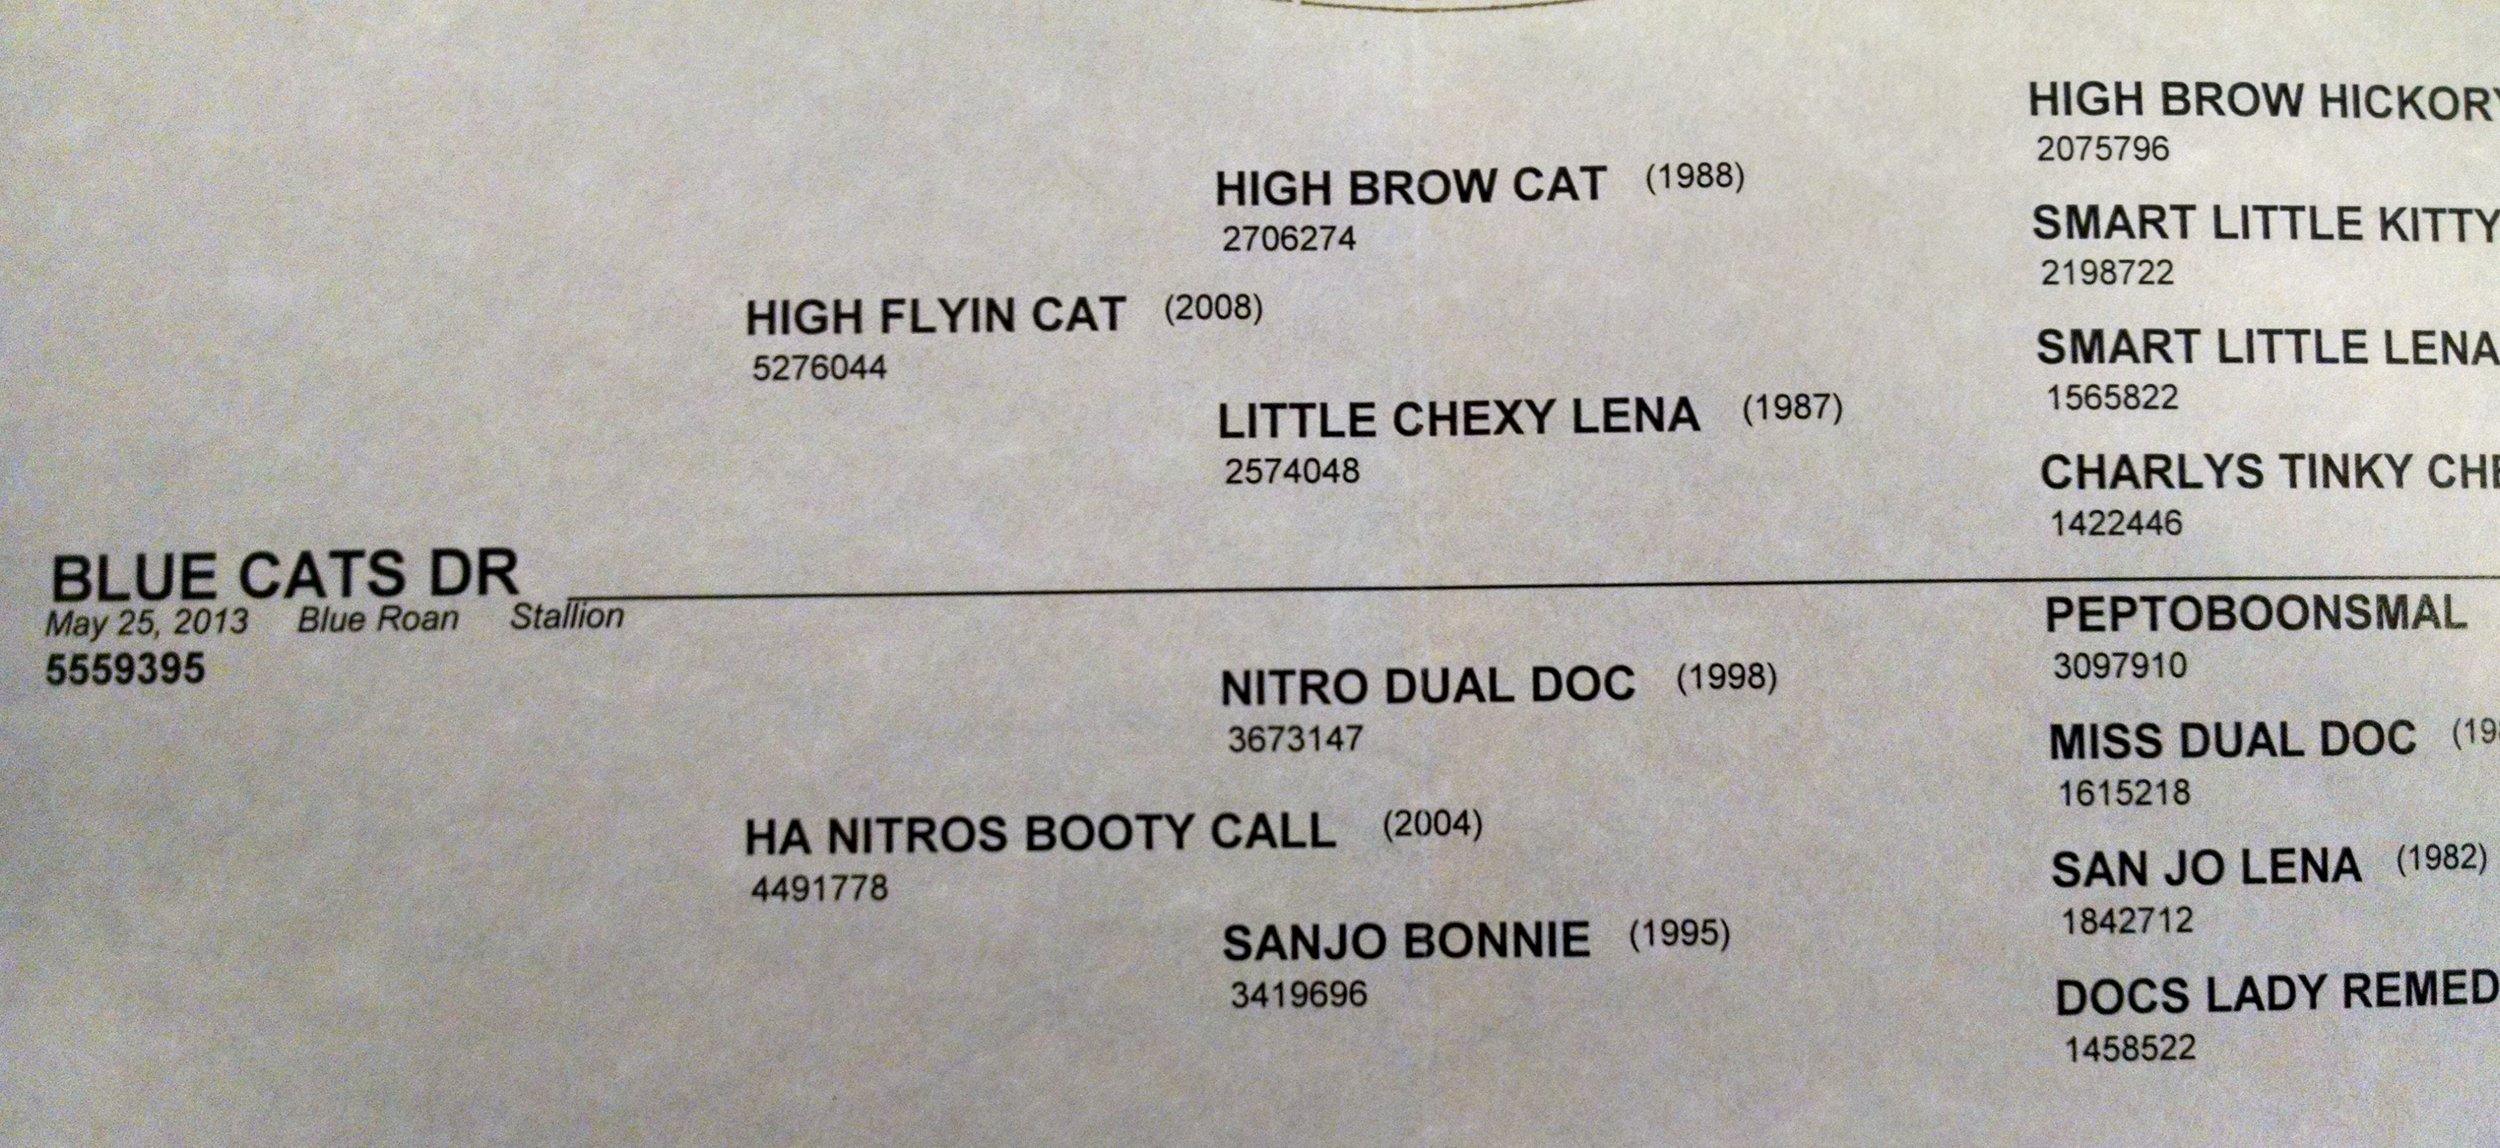 bule cats dr.jpg